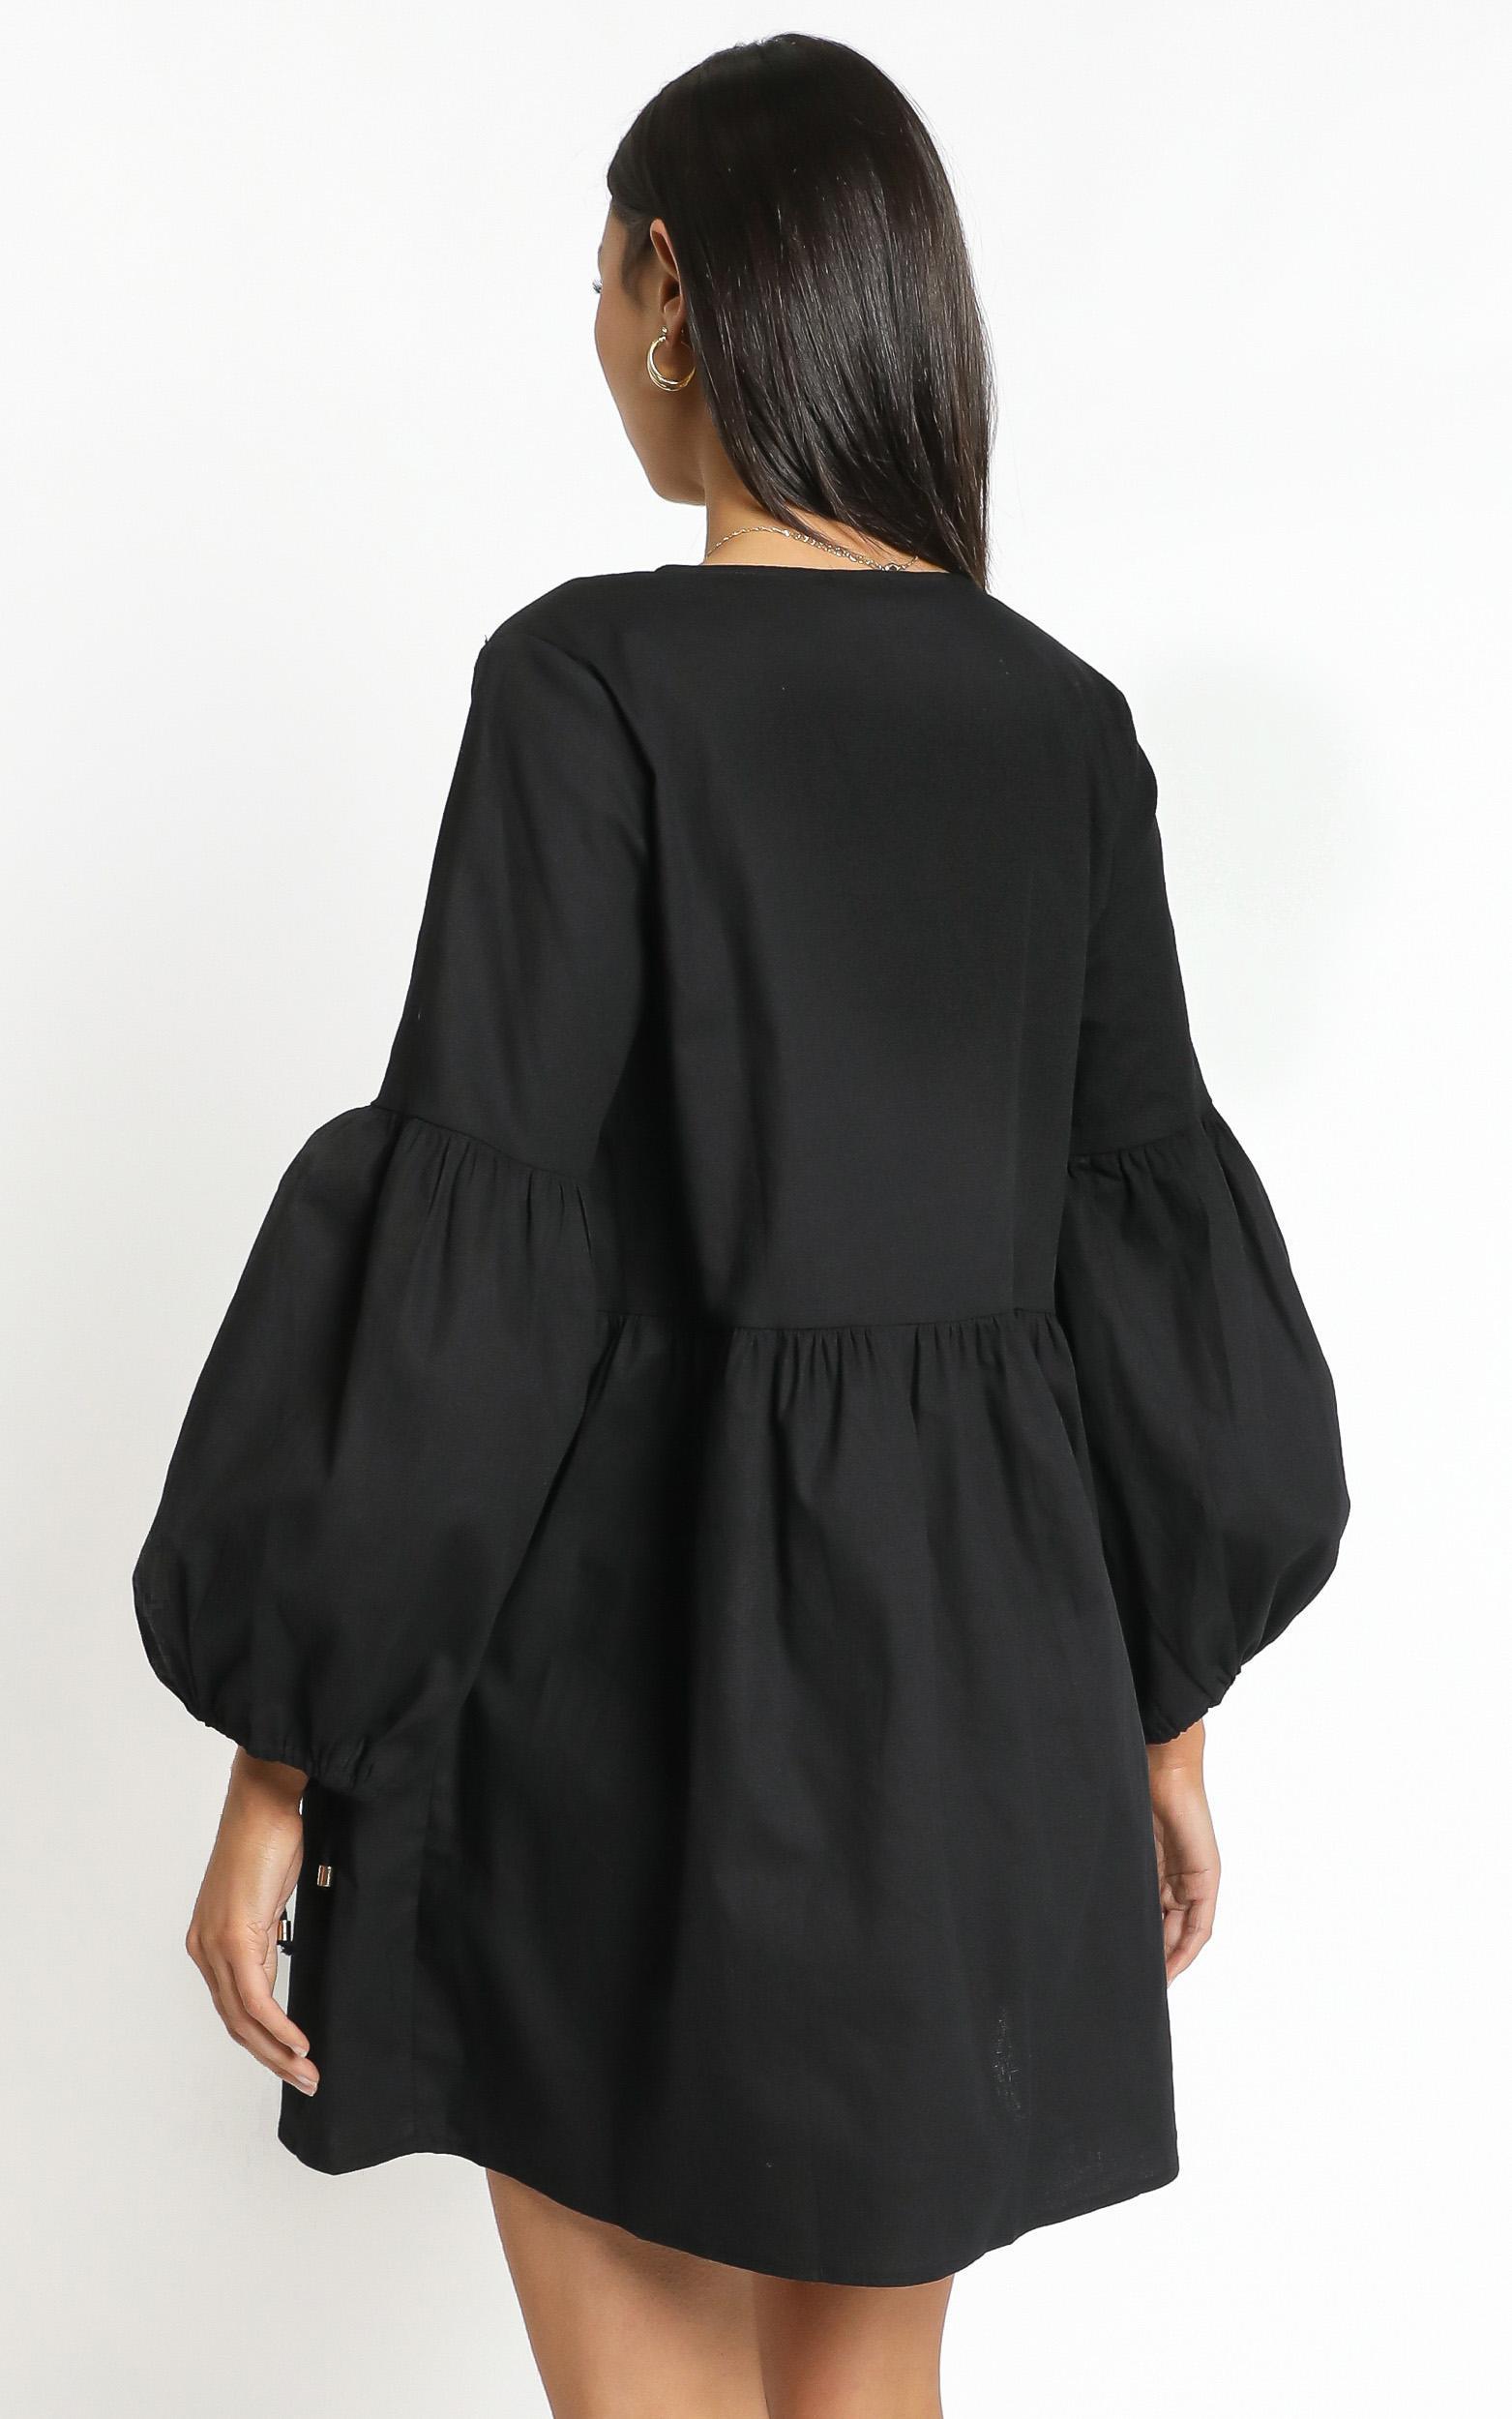 Zya The Label - Marigold Dress in Black - 14 (XL), Black, hi-res image number null